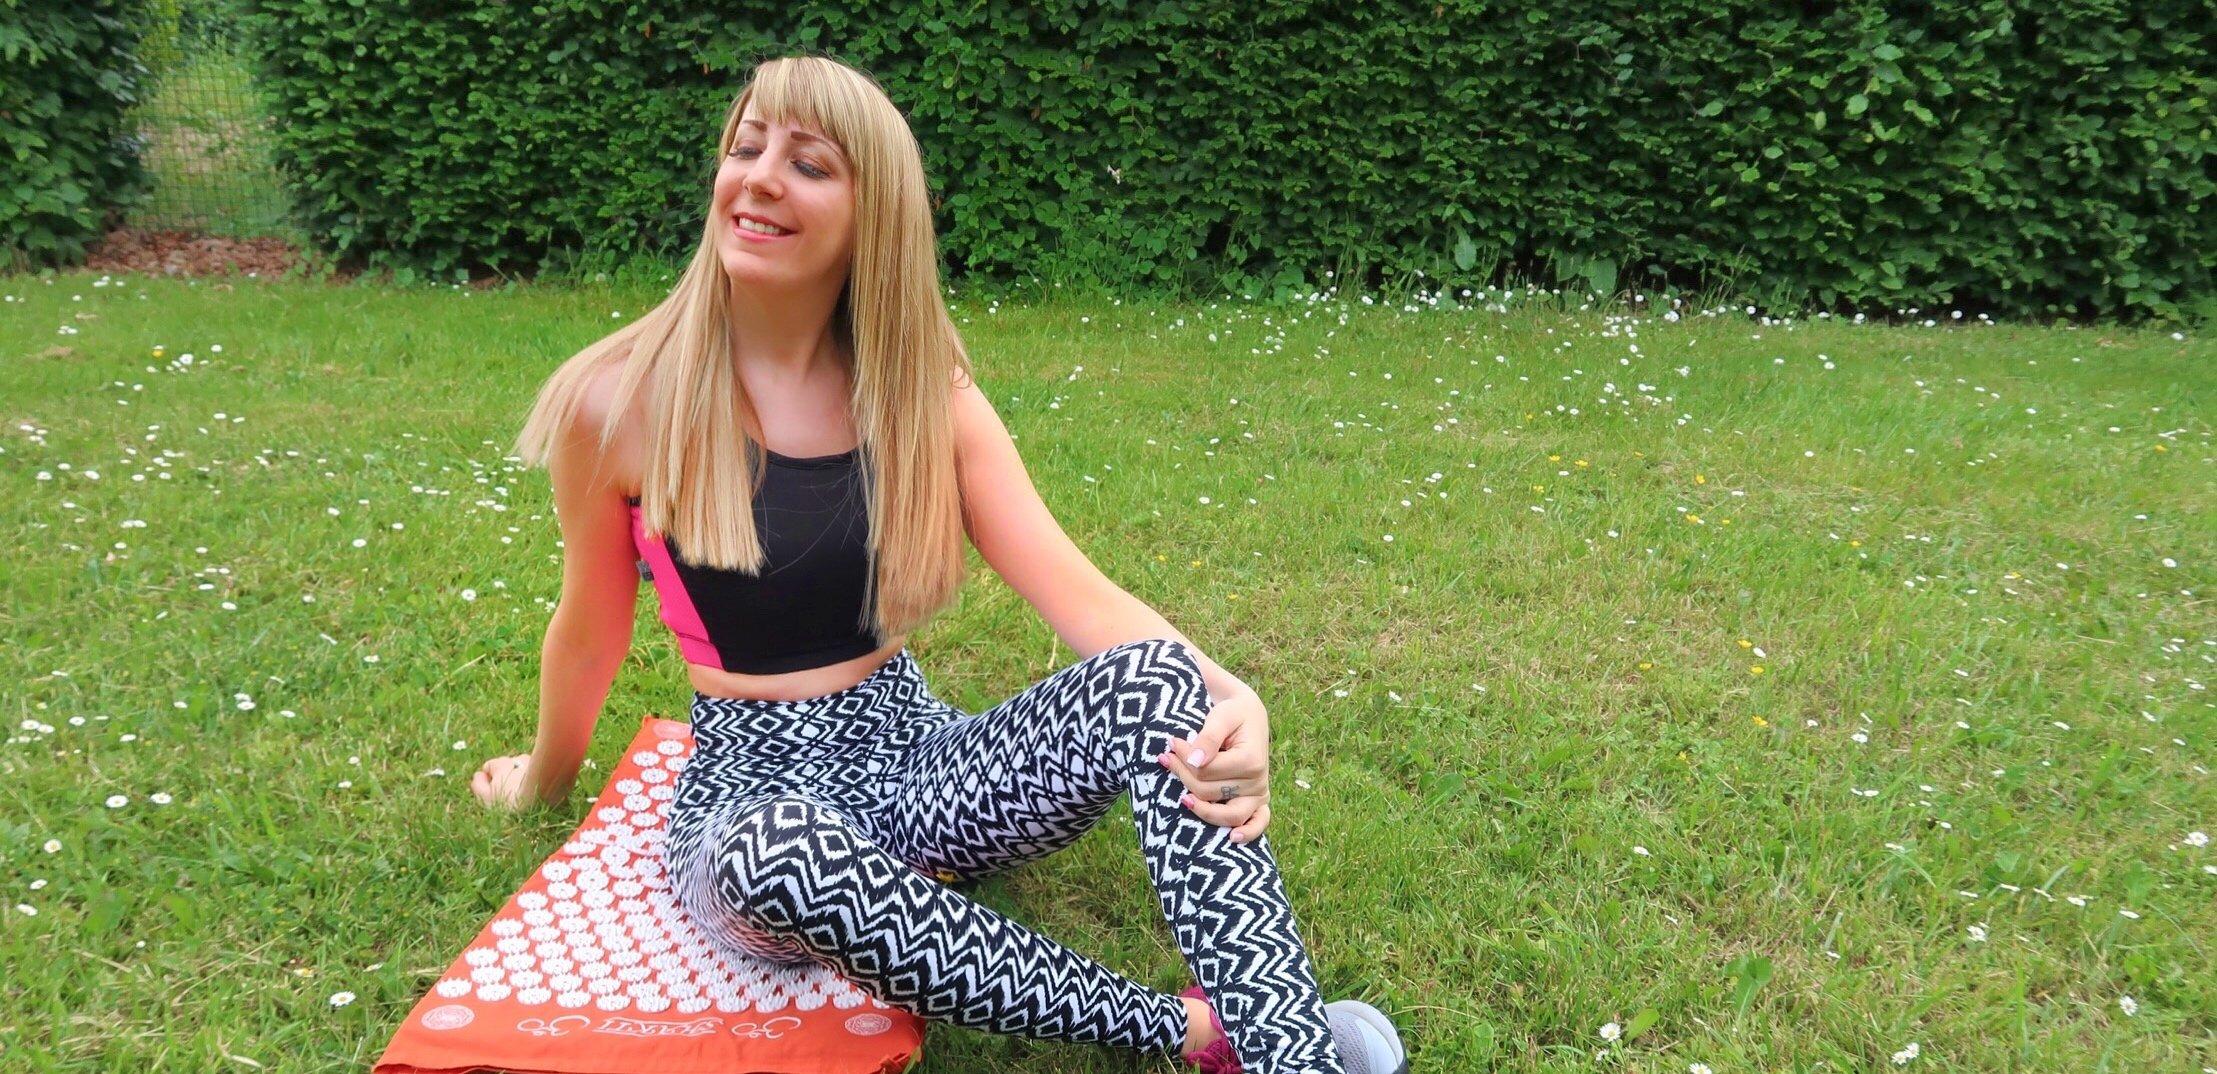 jennaminnie jenna minnie fashion blog Relaxed in 20 minutes with Shakti Mat